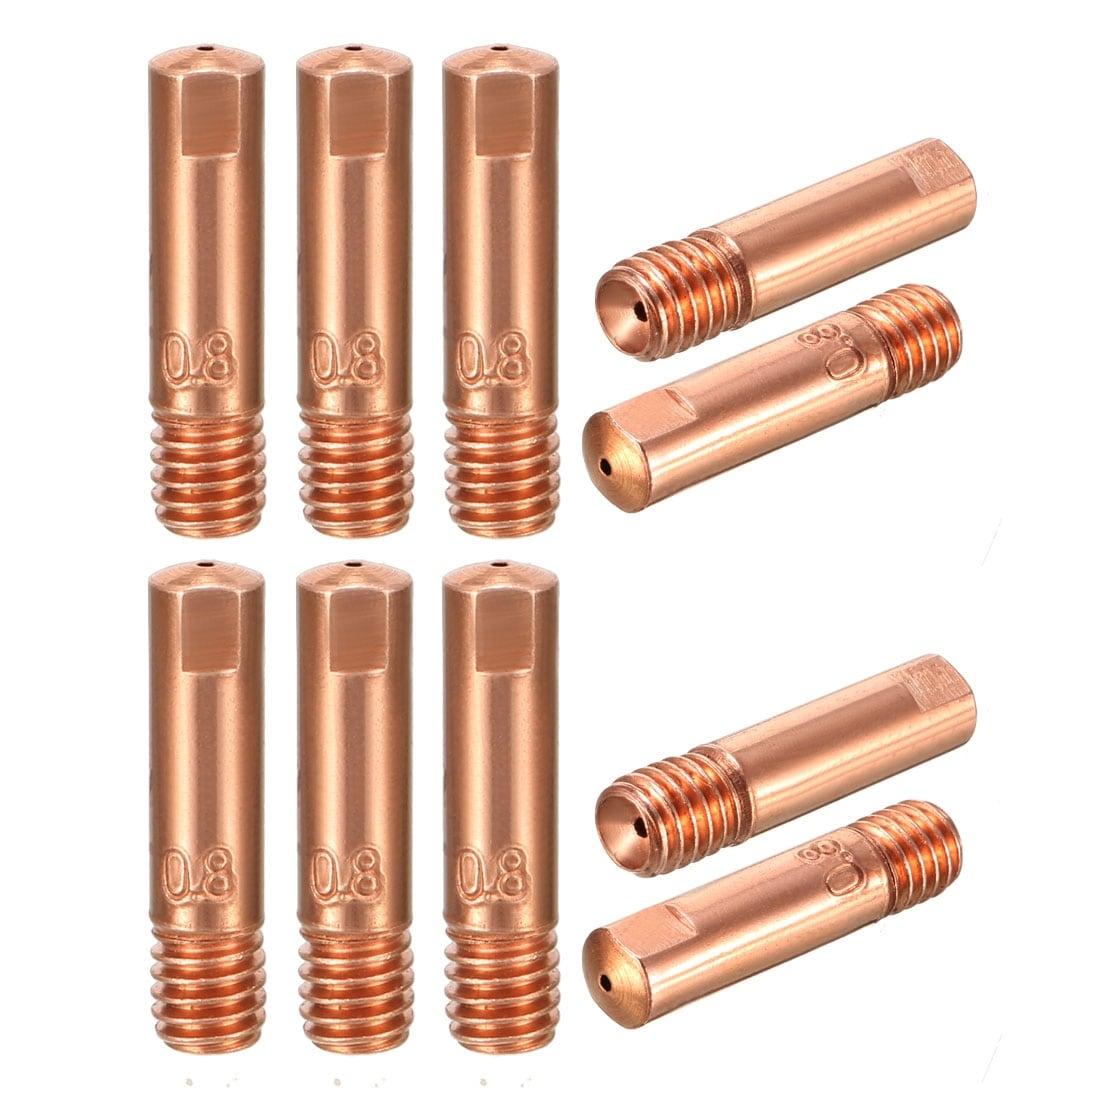 10pcs Gas Nozzle Gold 15AK-0.8mm Mig Mag Welding Weld Torch Contact Tips .*/_GZU